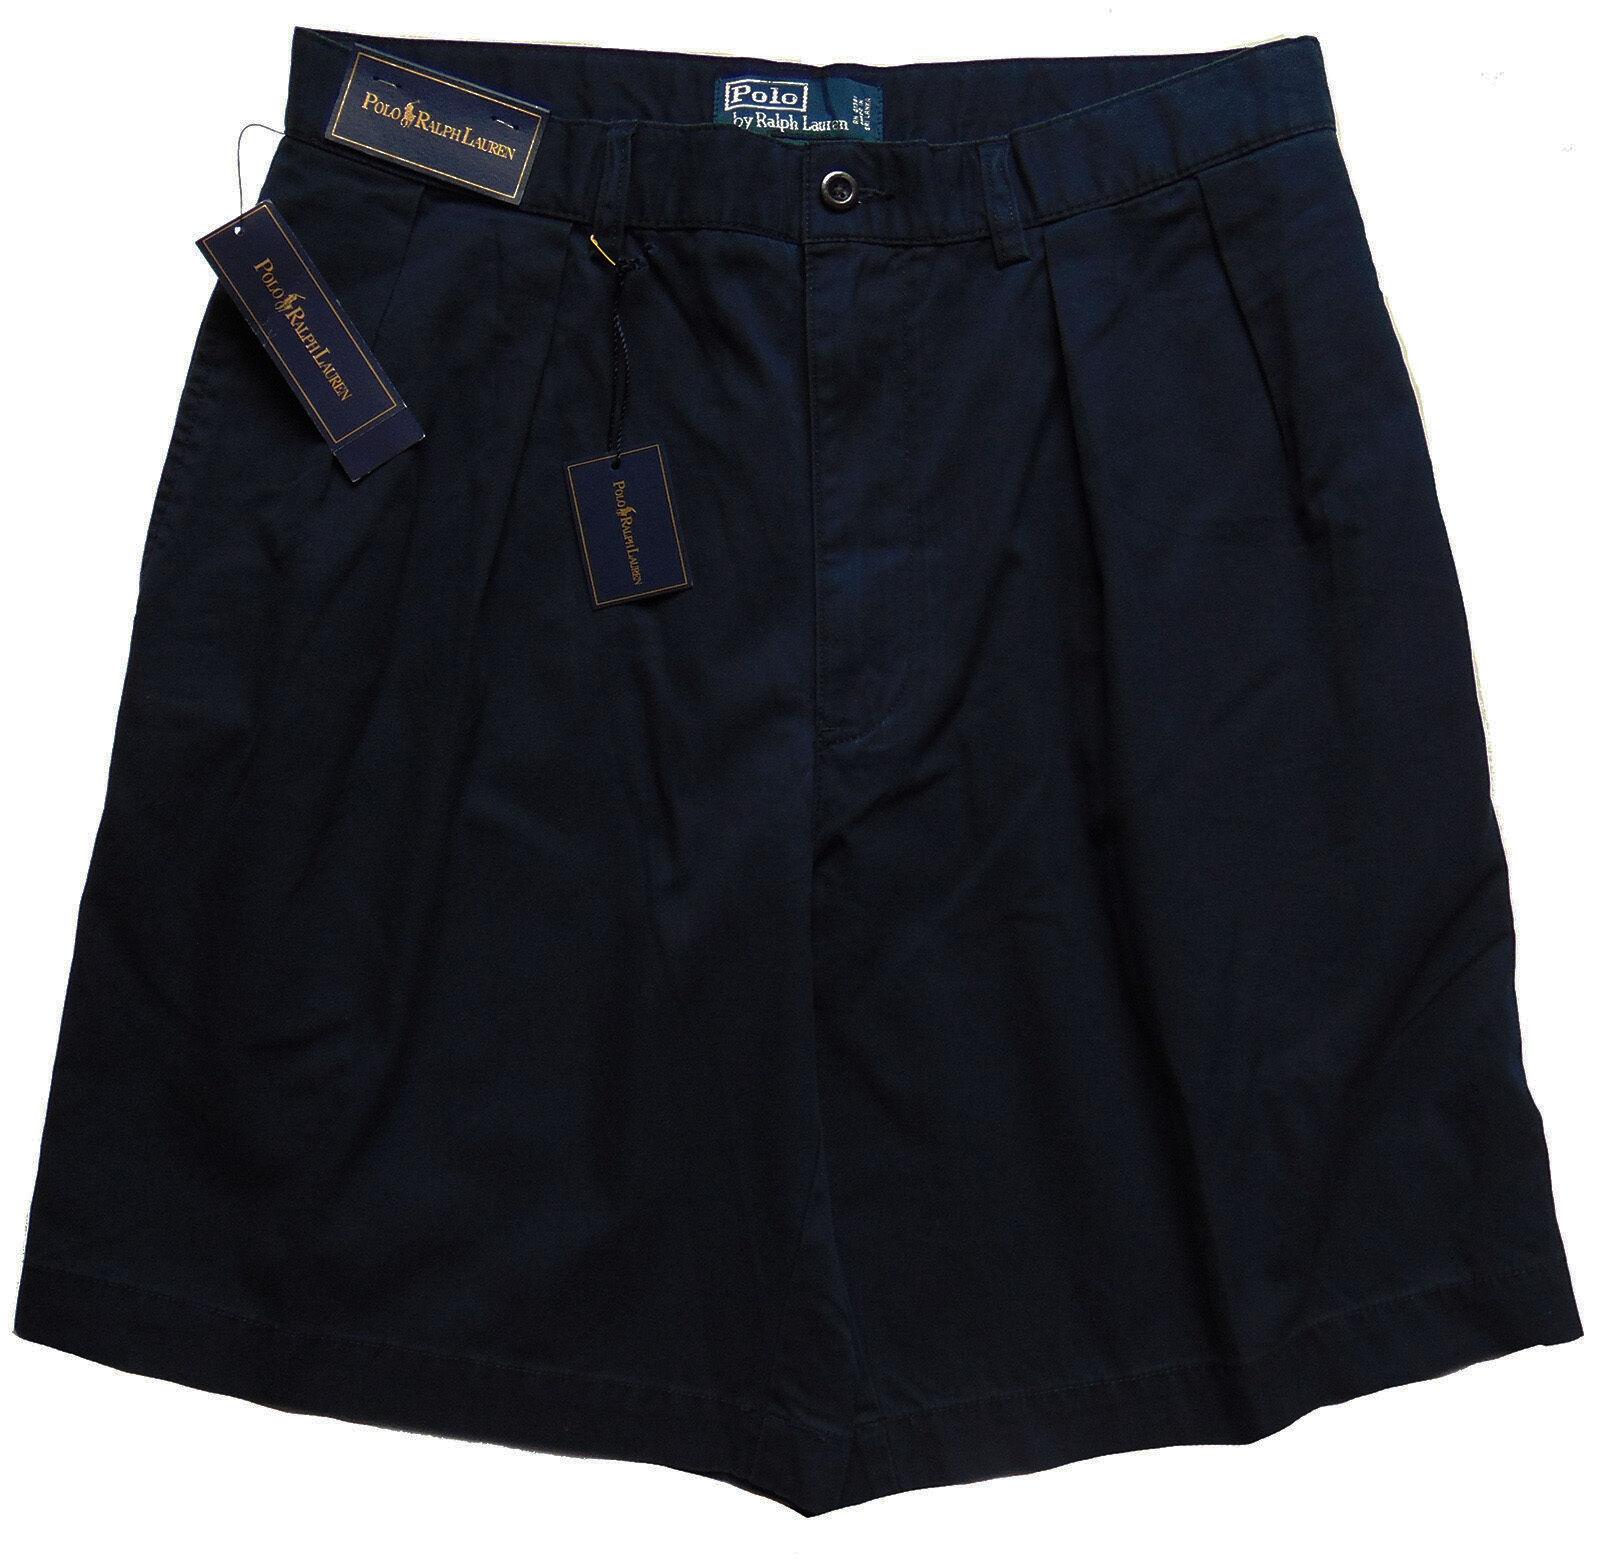 Men's POLO RALPH LAUREN Navy bluee TYLER Twill Logo Shorts 30 NWT NEW +